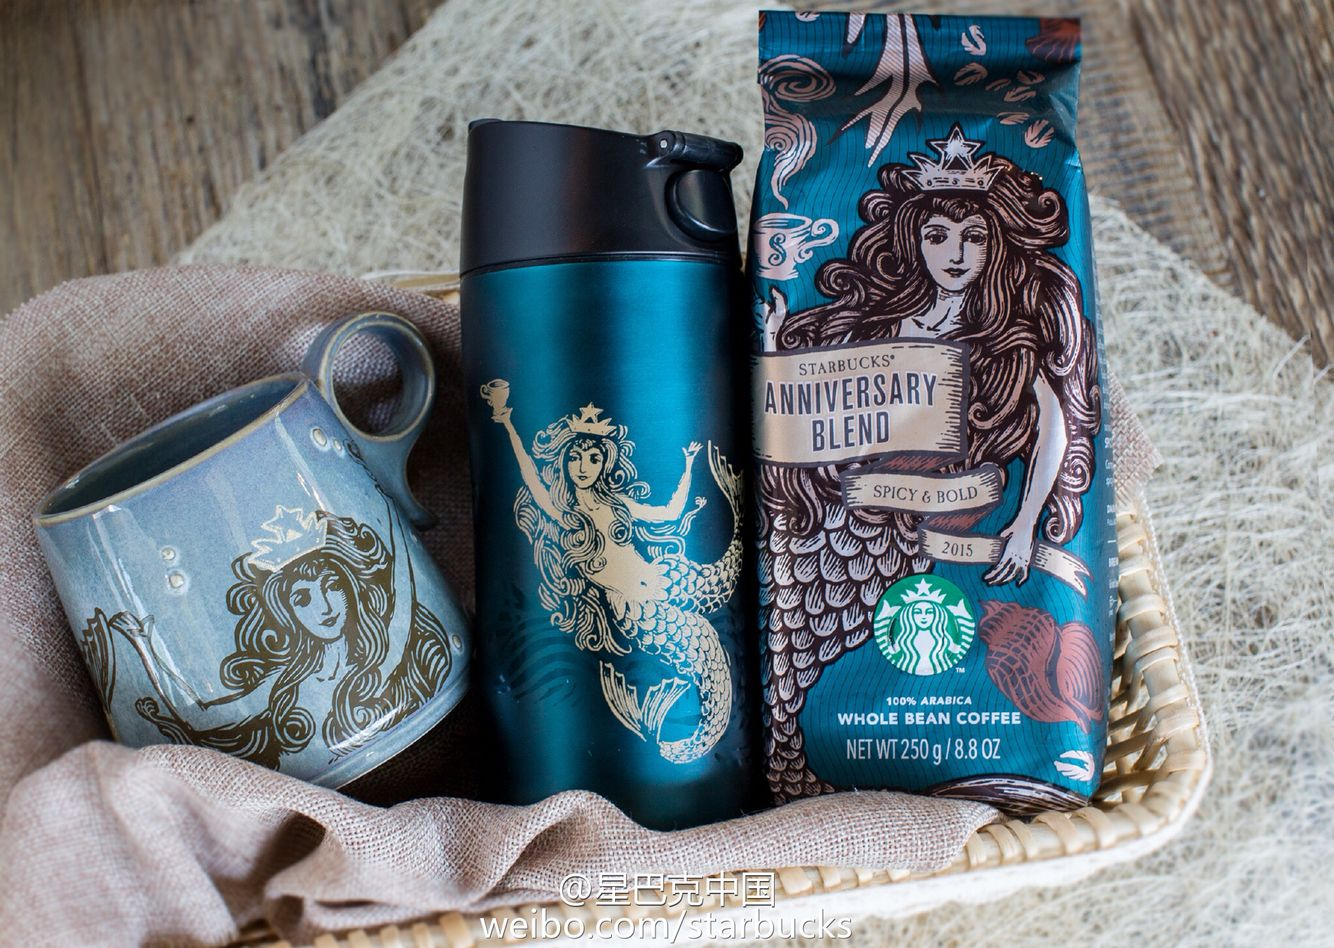 Starbucks Starbucks, Tumbler coffee cups, Coffee beans